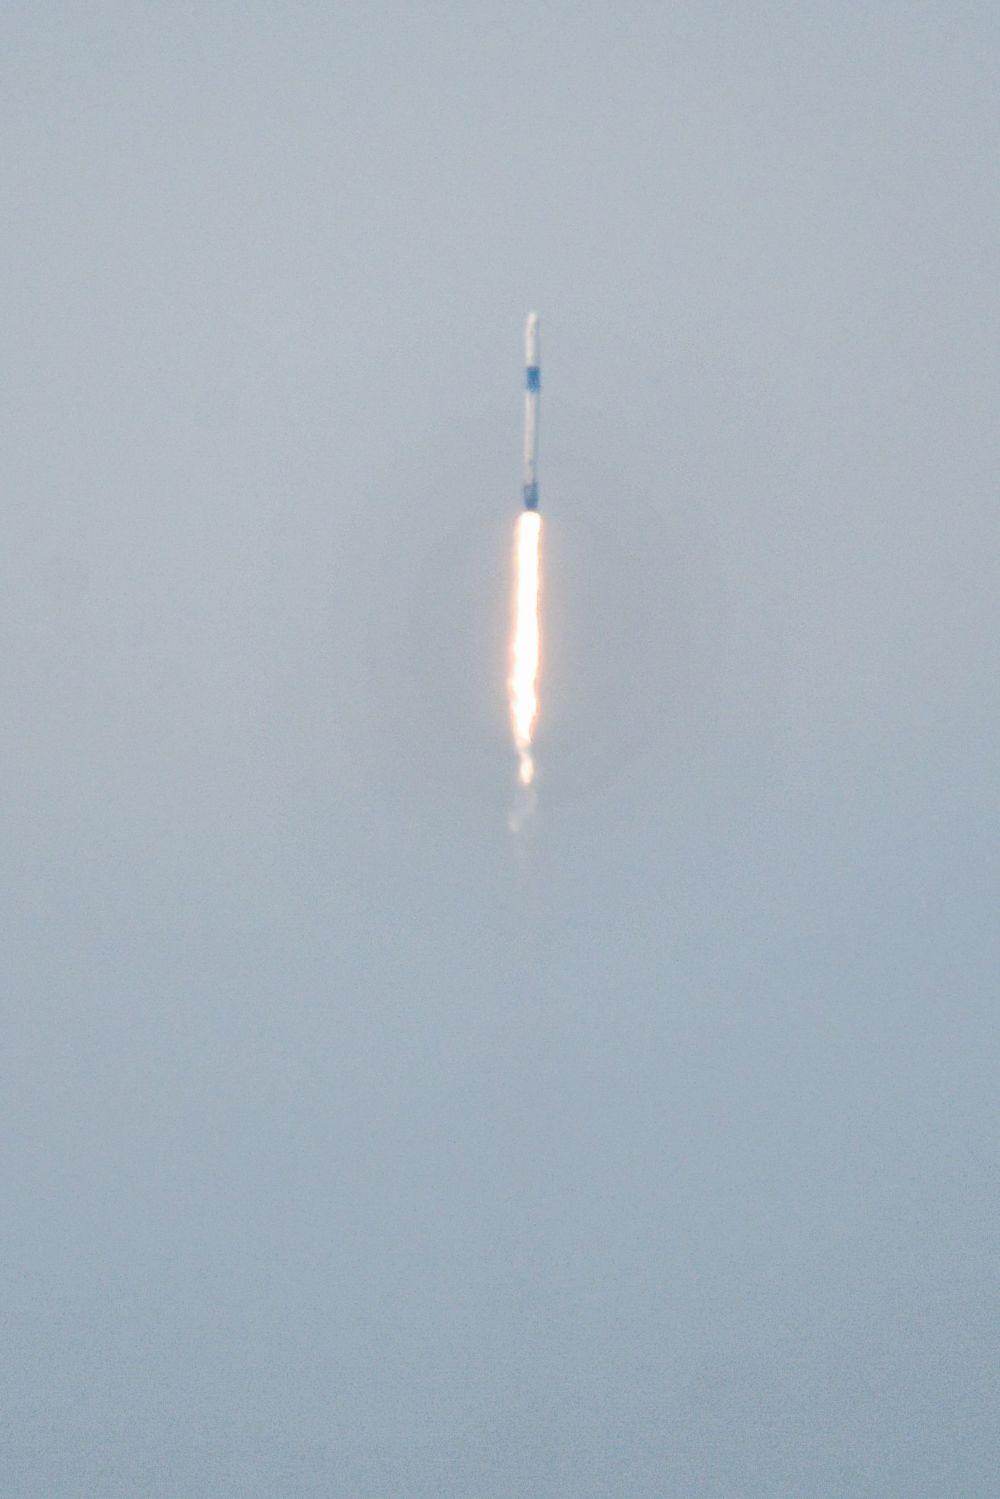 SpaceX Crew Dragon Demo2